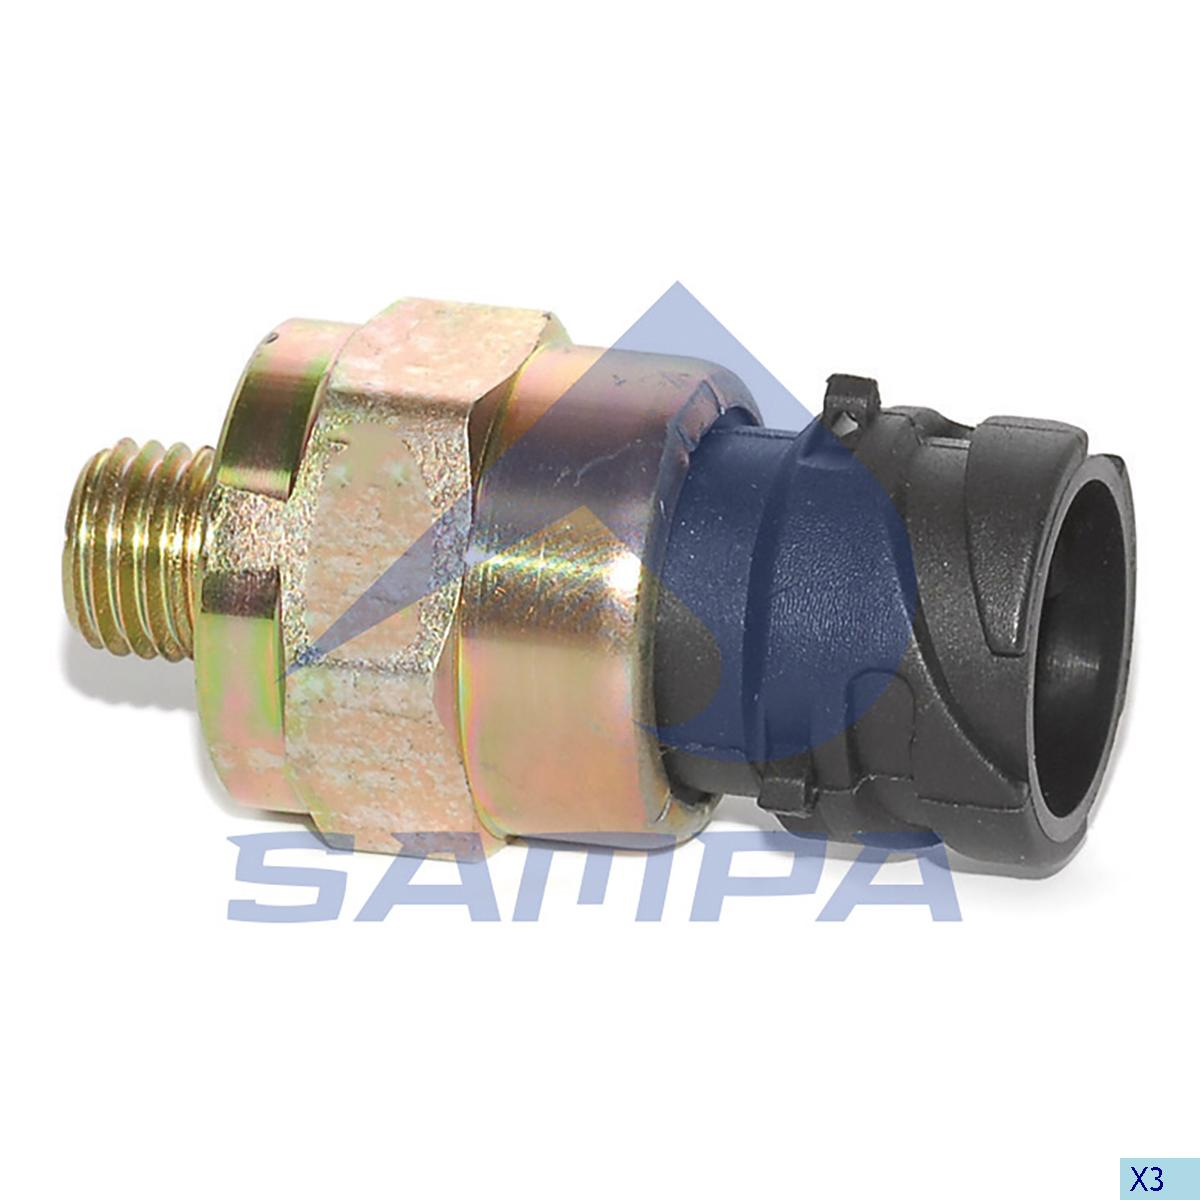 Pressure Sensor, Mercedes, Electric System